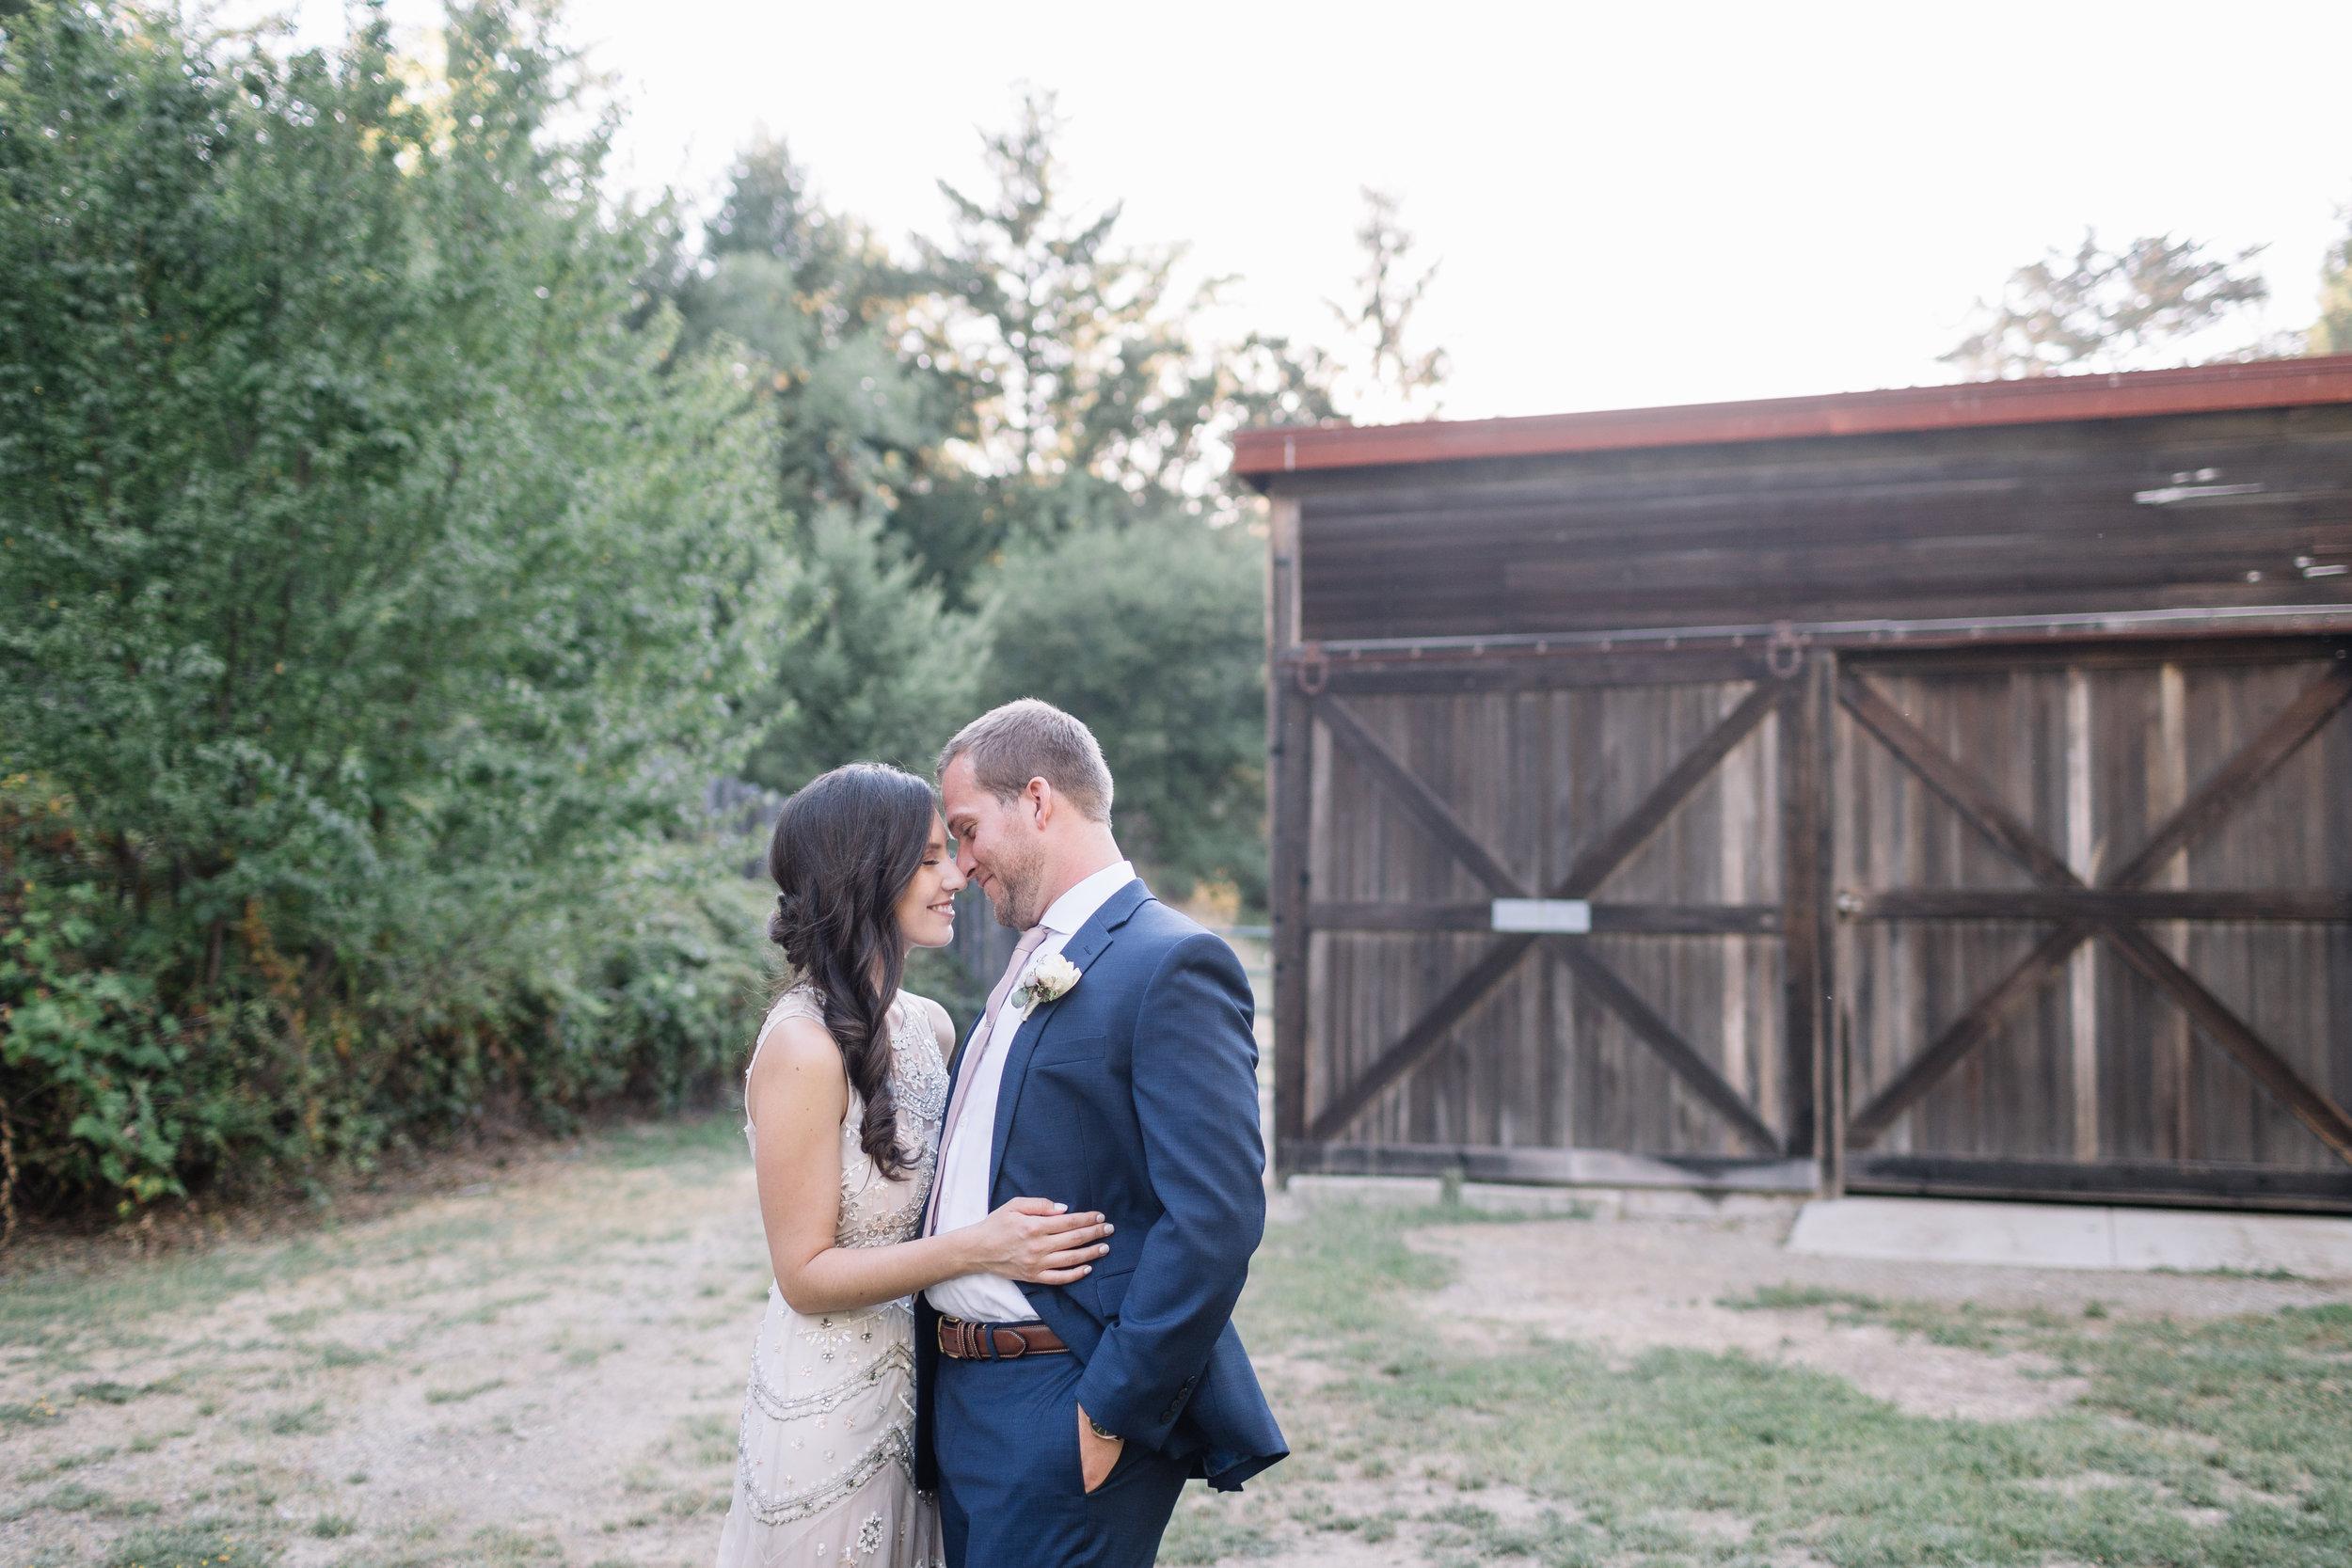 LishaWangPhotography_Carly_Matt_Wedding-186.jpg